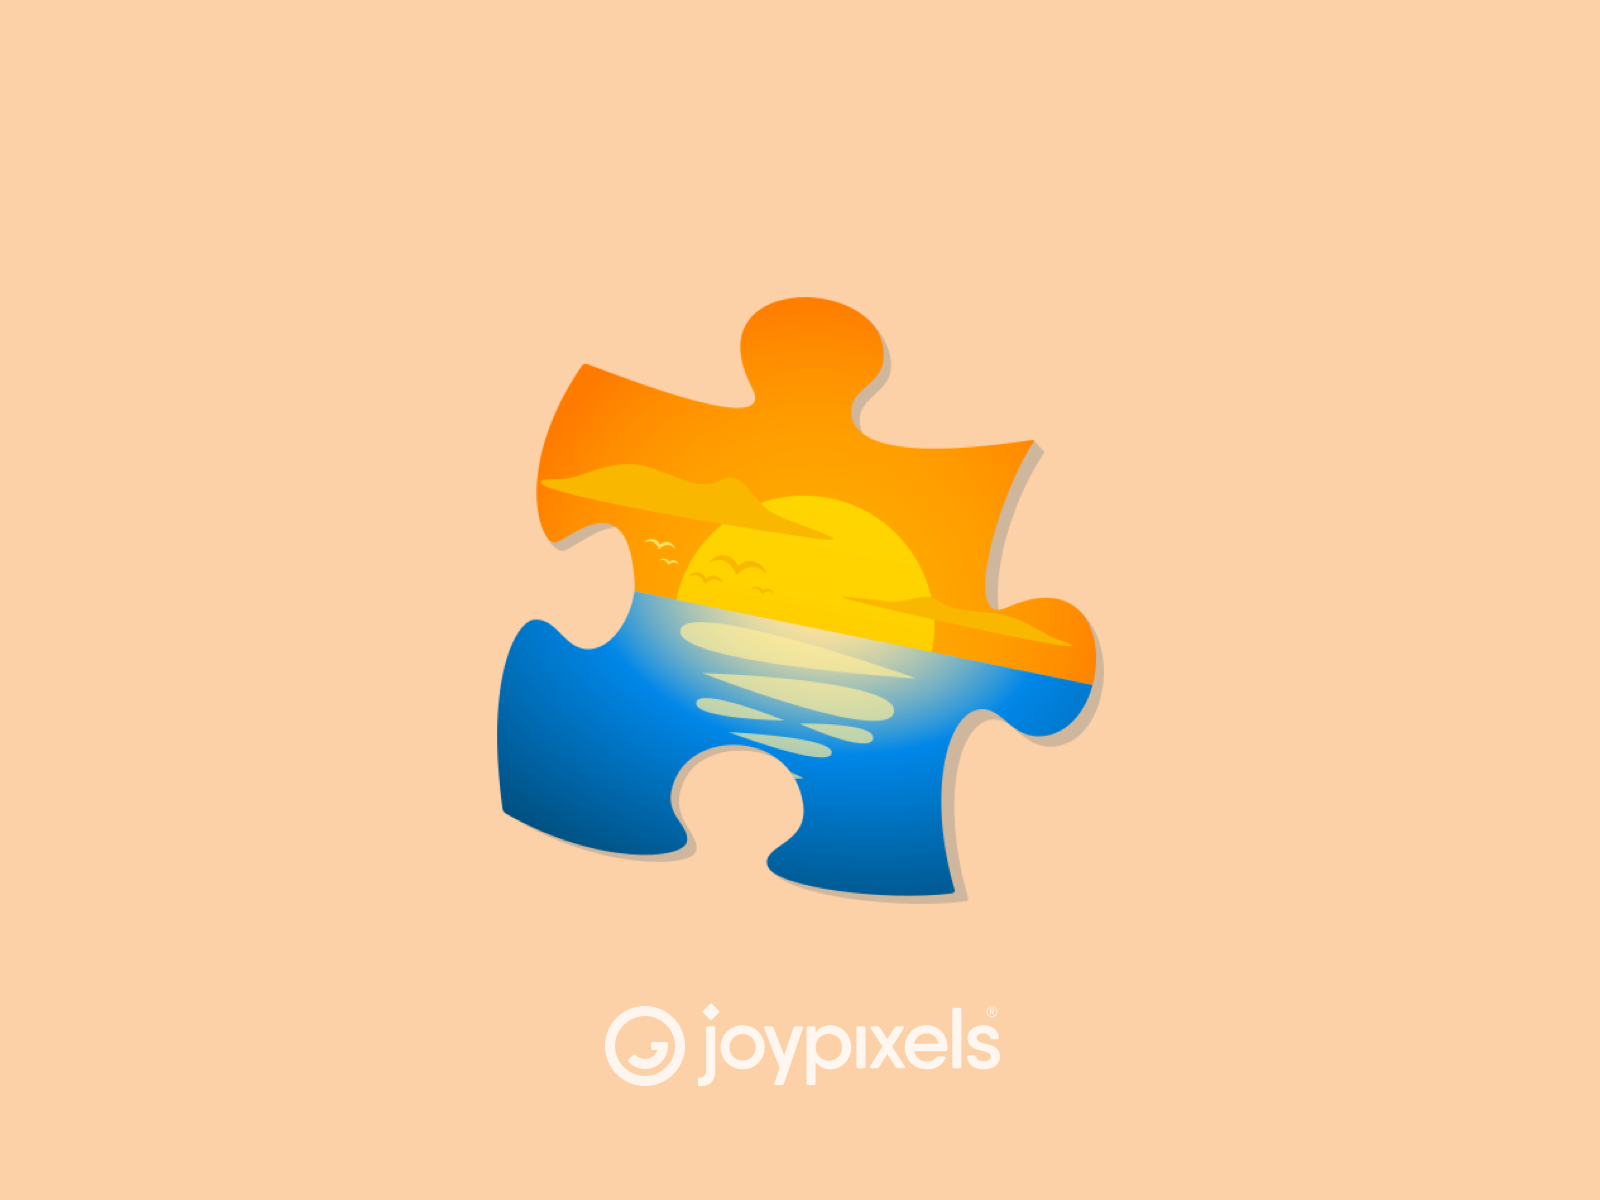 The Joypixels Puzzle Piece Emoji Version 4 5 Fairy Emoji Emoji Puzzle Pieces